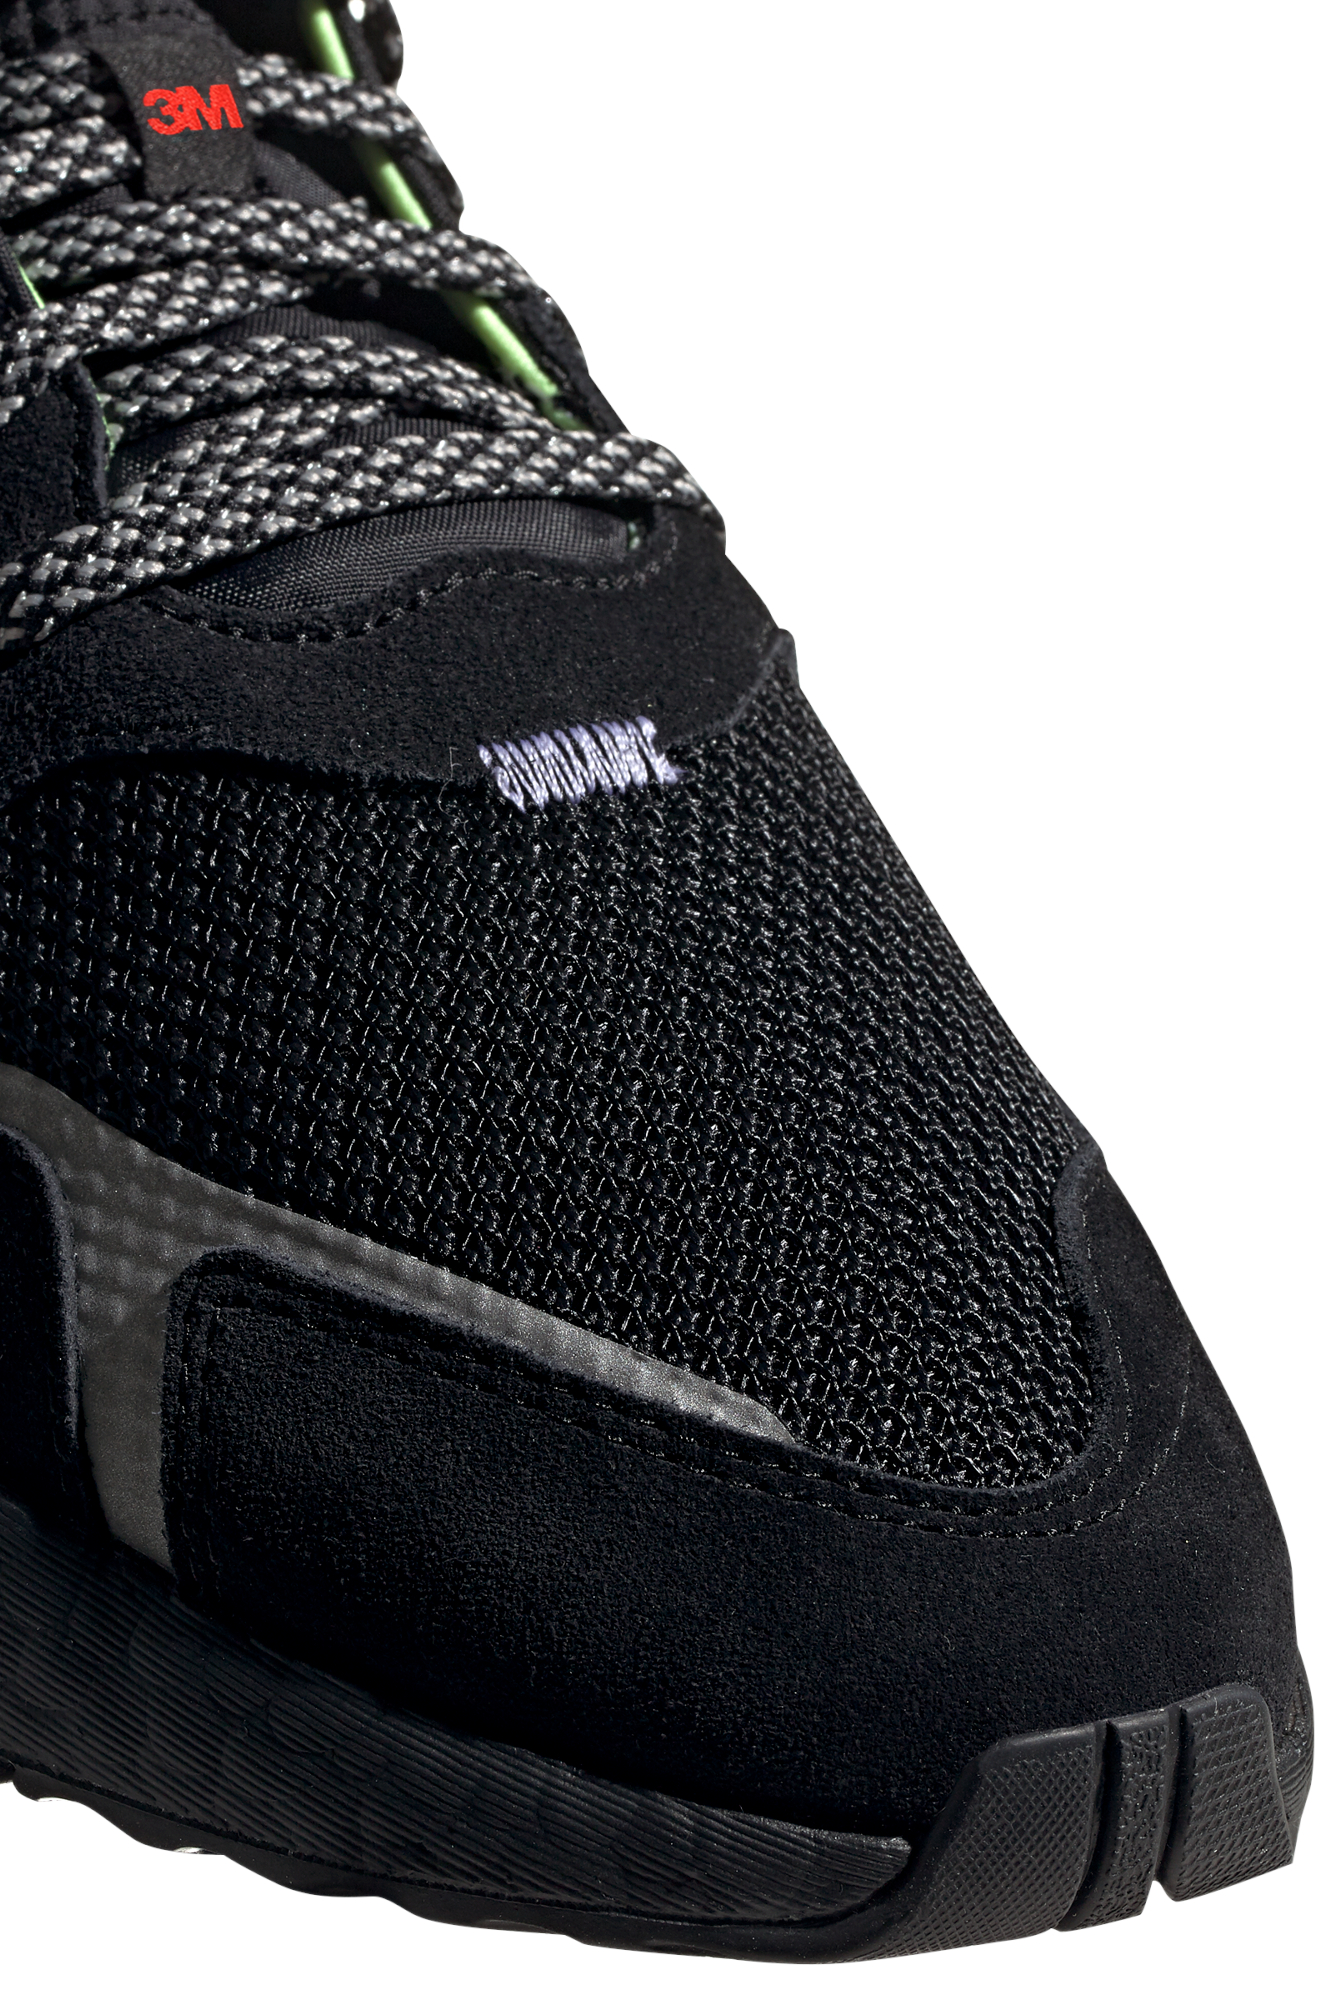 Buty adidas Originals Nite Jogger EE5884 Na co dzień